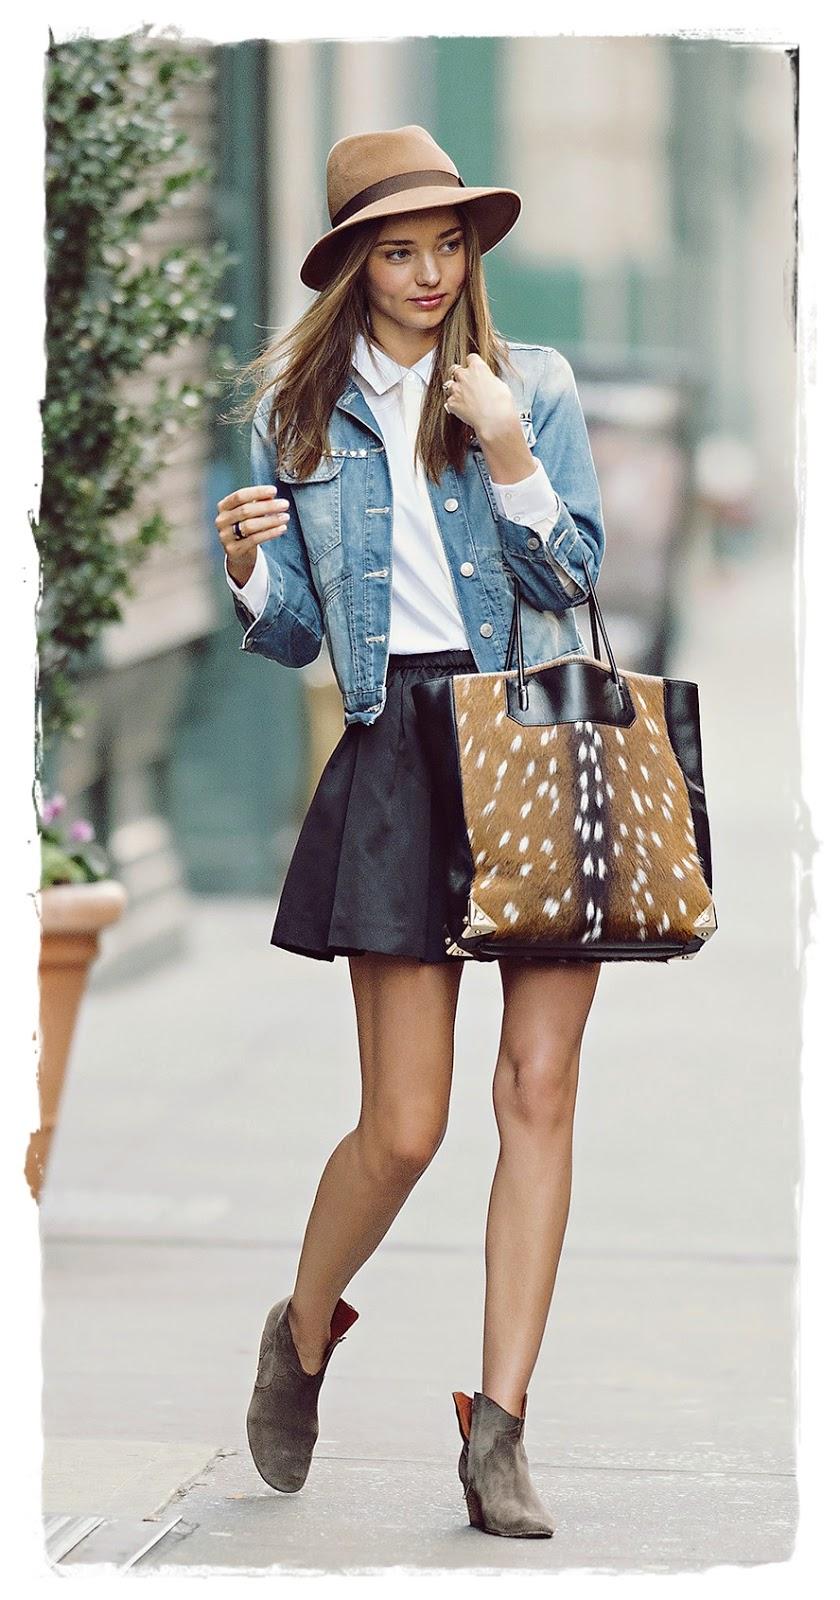 Miranda kerr street style snapshot add a denim jacket Fashion style mag images